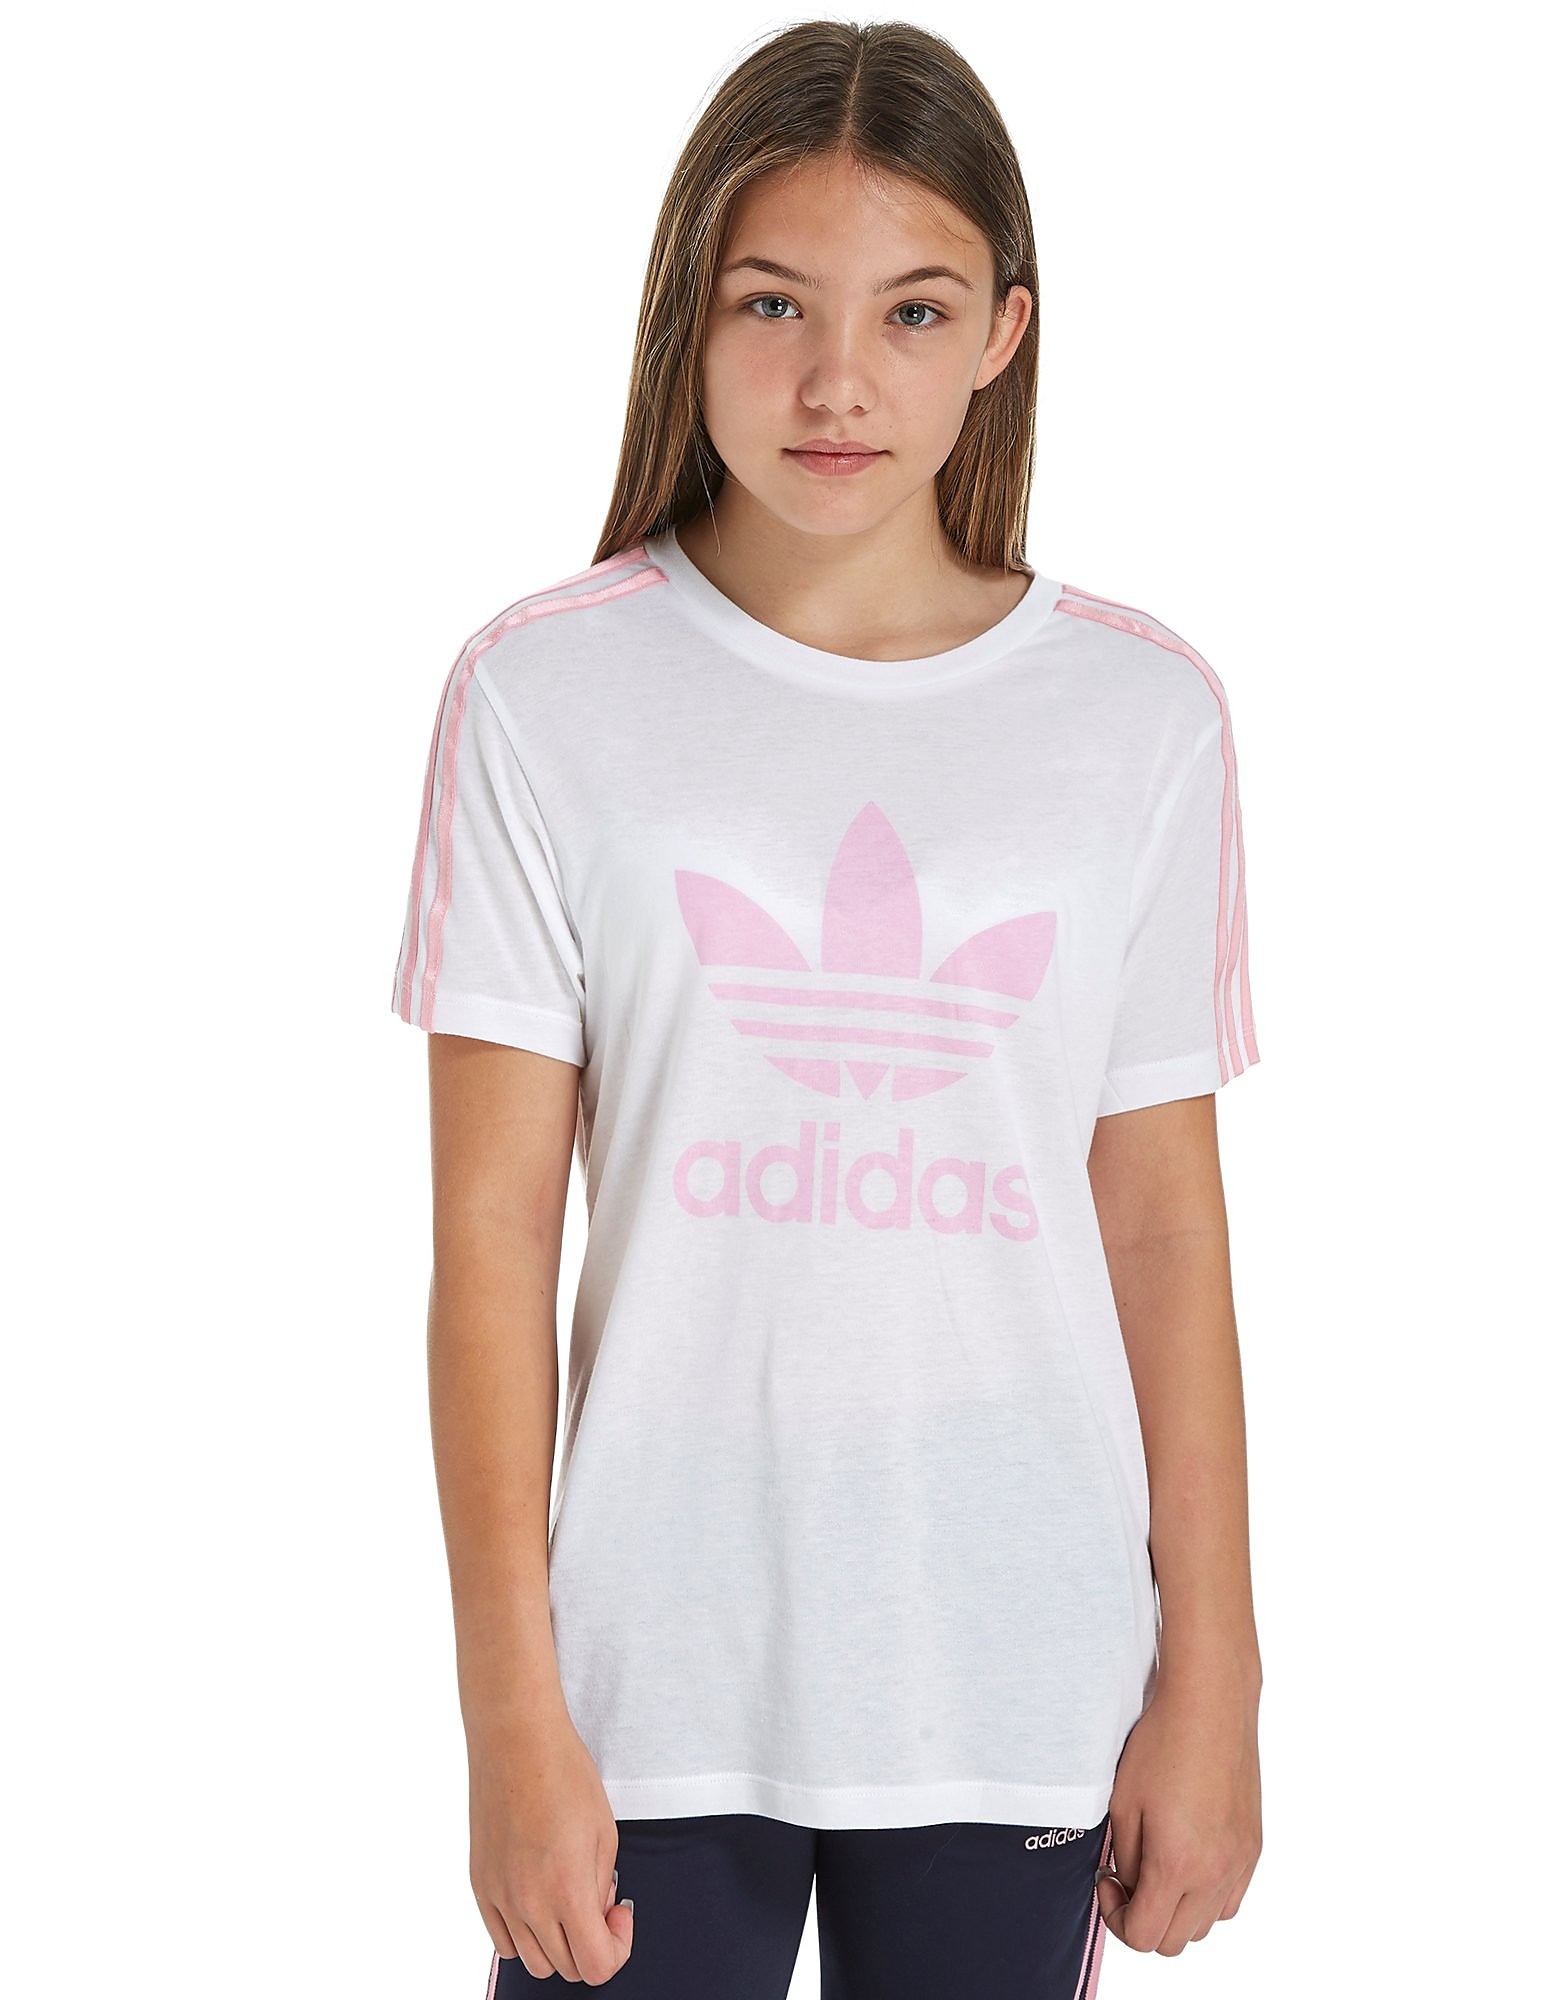 adidas Originals 3-Stripes Boyfriend T-Shirt Juniors'